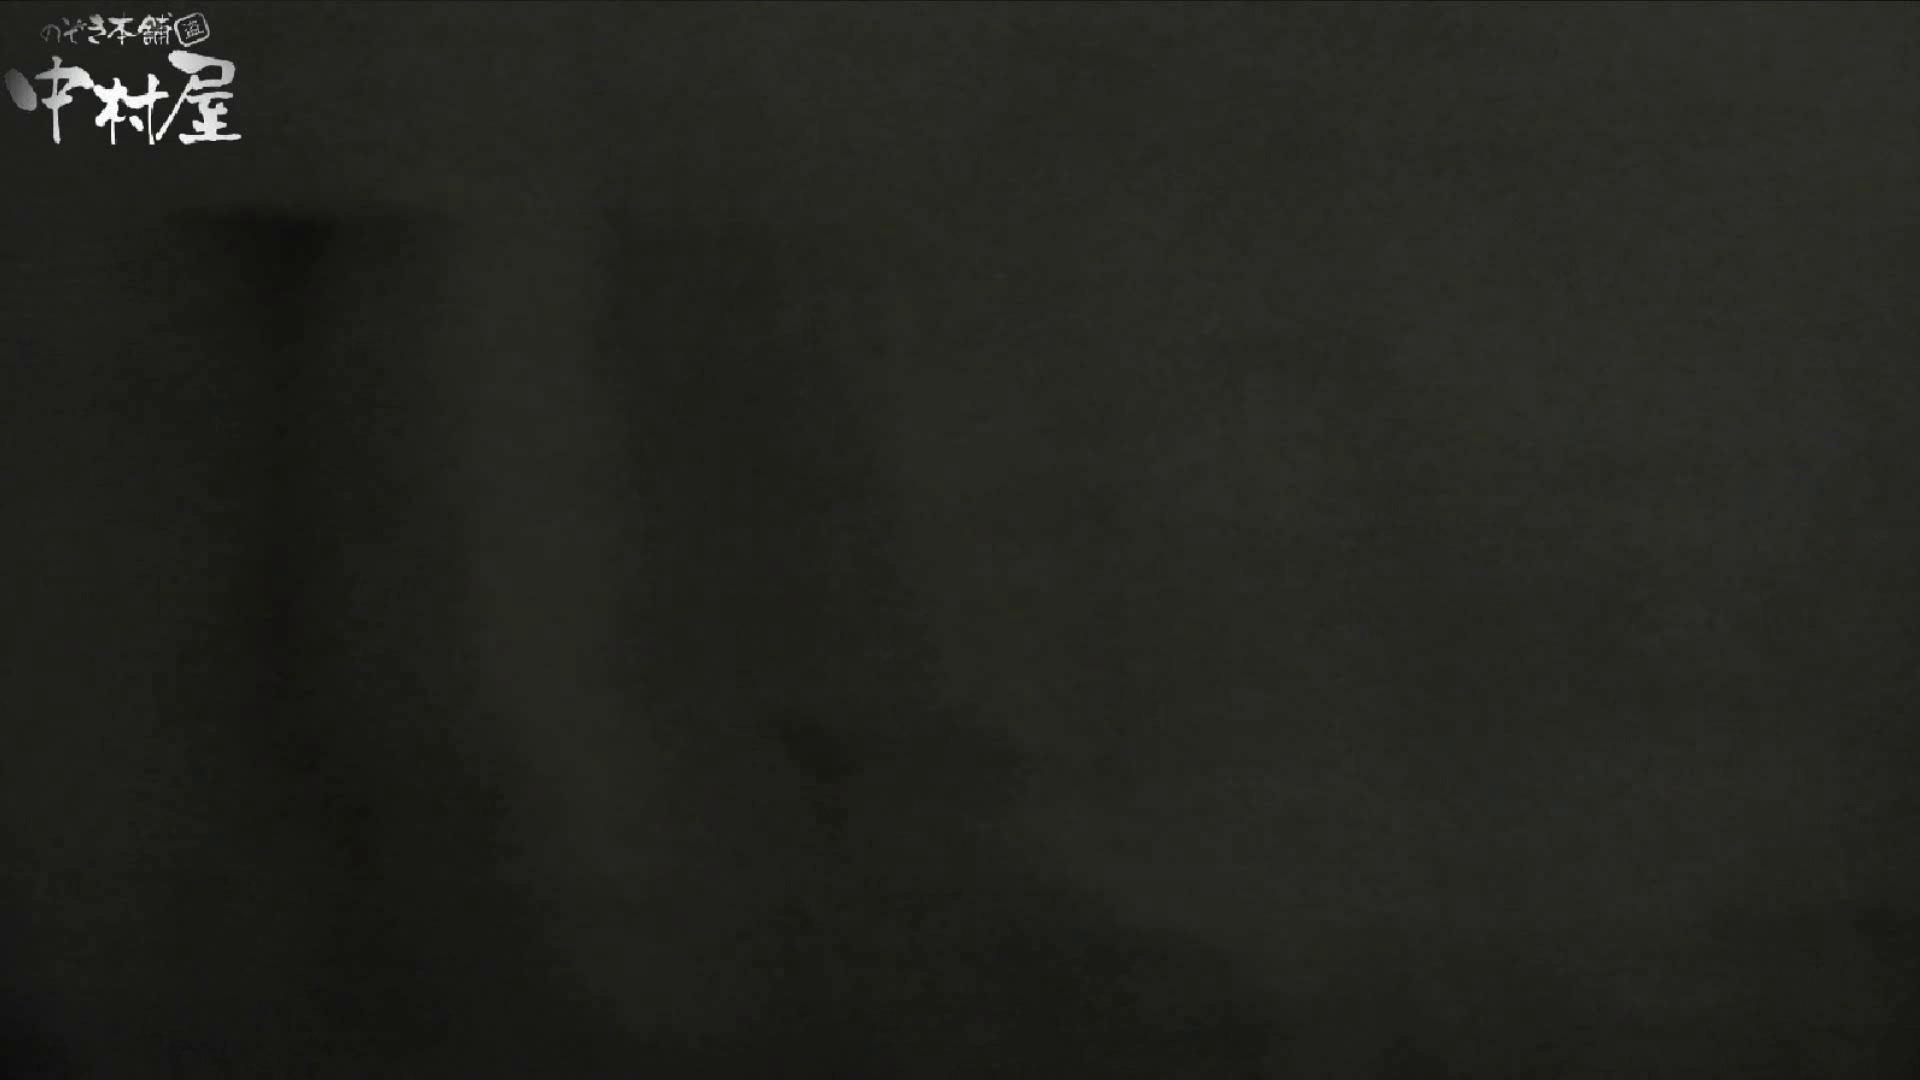 vol.25 命がけ潜伏洗面所! 咥えタオルは剛毛の証!? 洗面所 ヌード画像 84連発 74